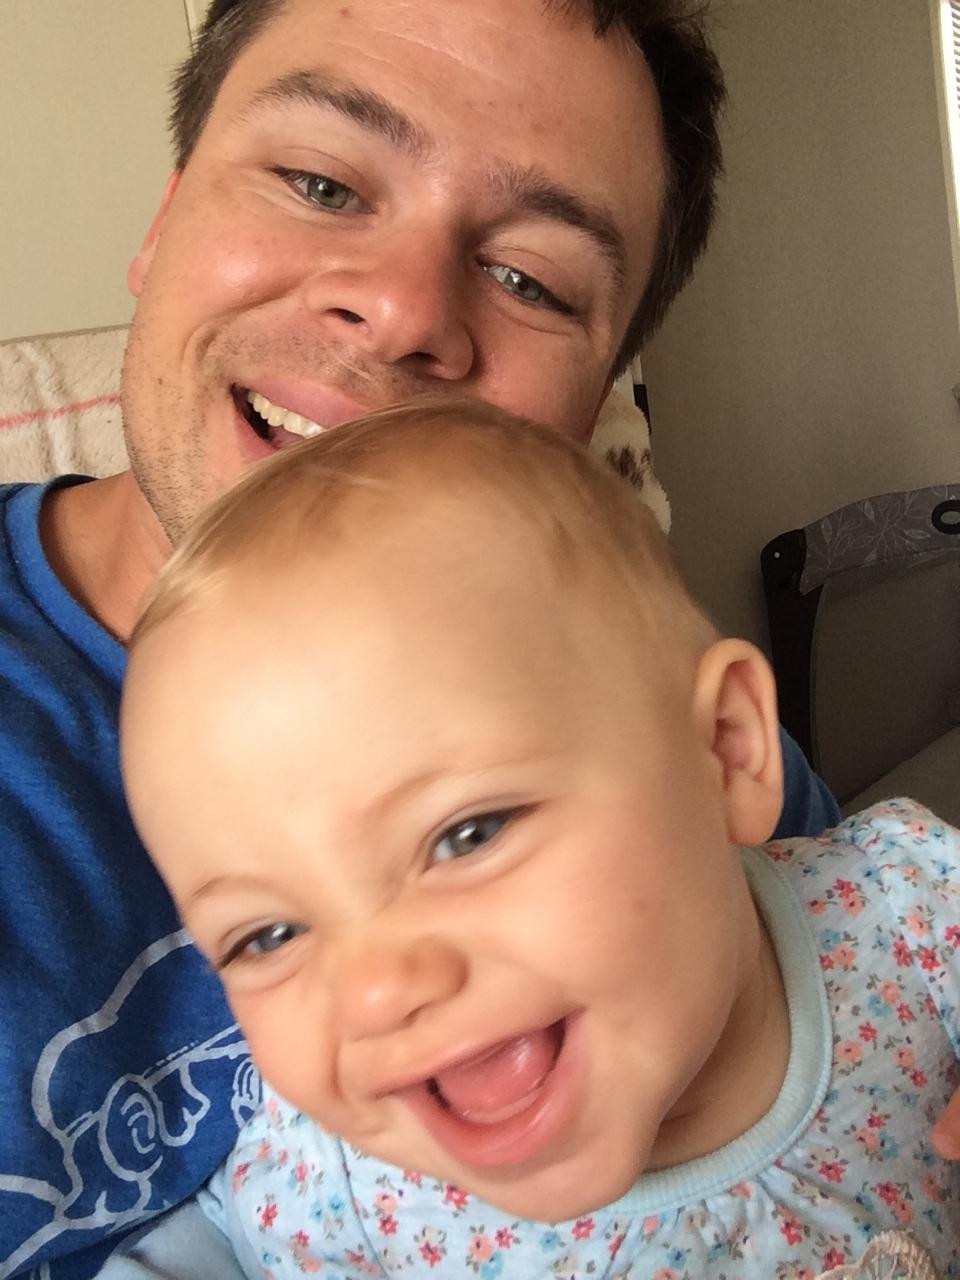 Me and Frey Frey... selfie!!!